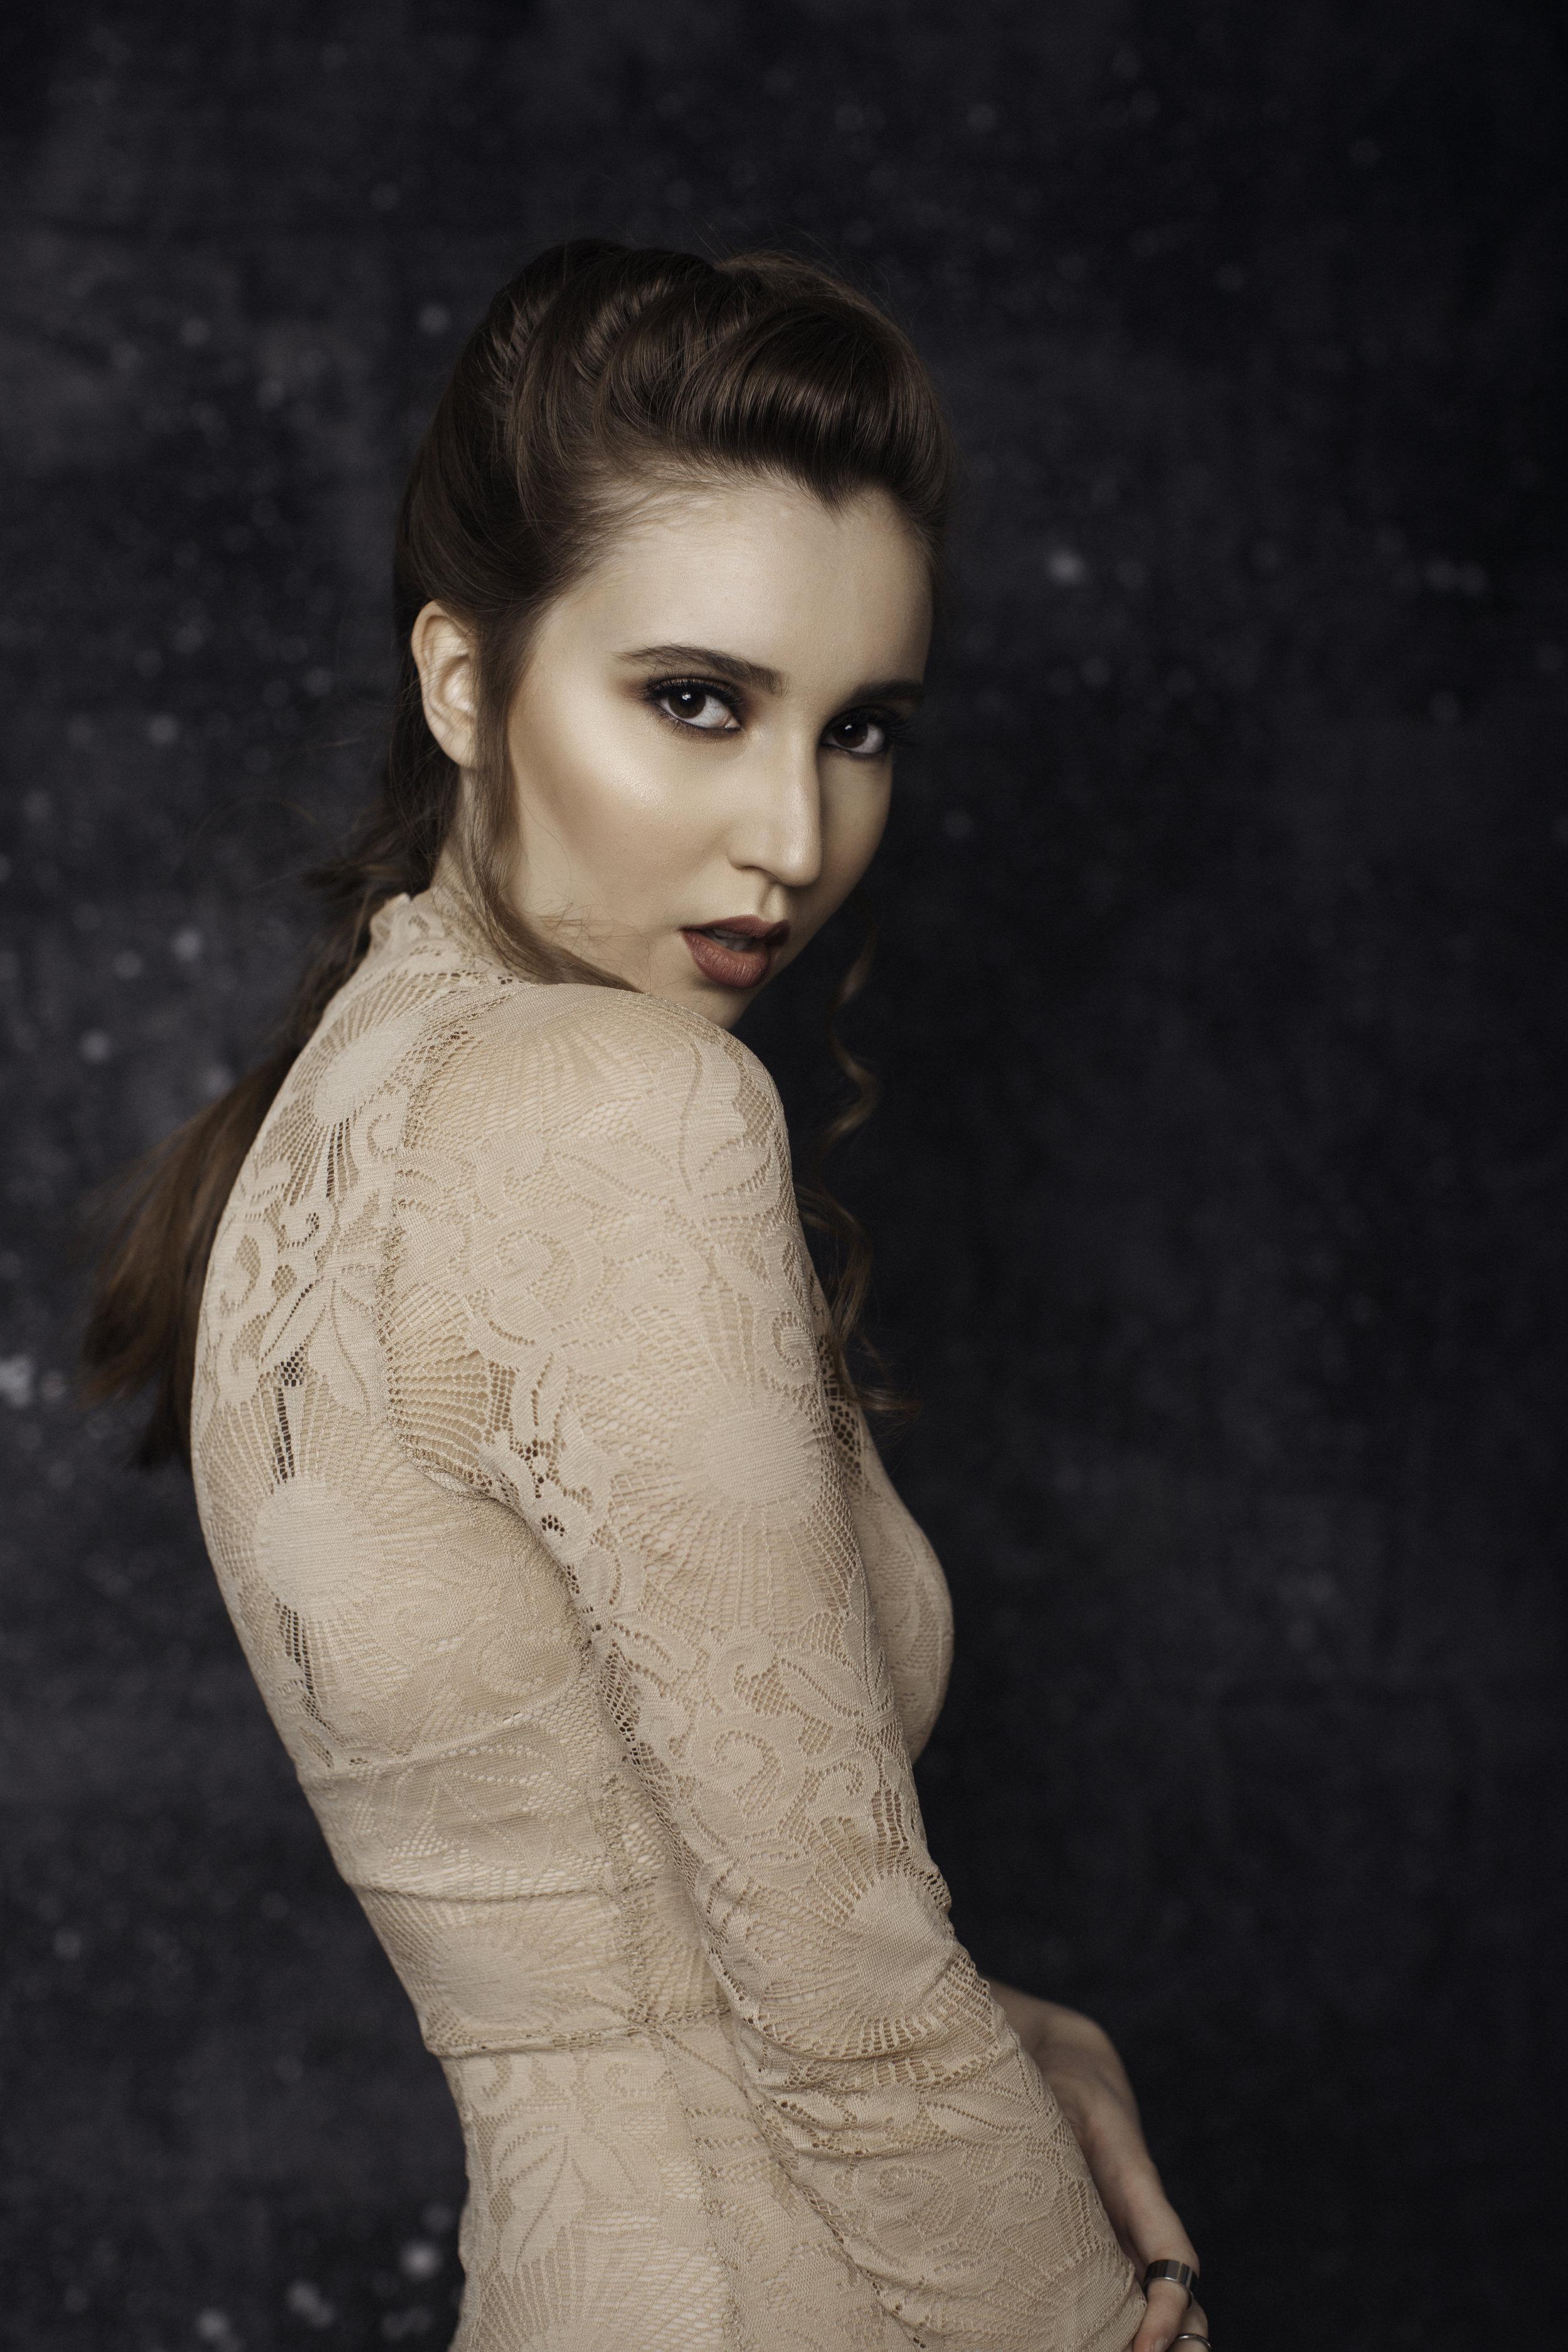 Model: Jordan LaRiviere   Makeup Artist/Hairstylist: Hamana Arshad of HamanasArtistry